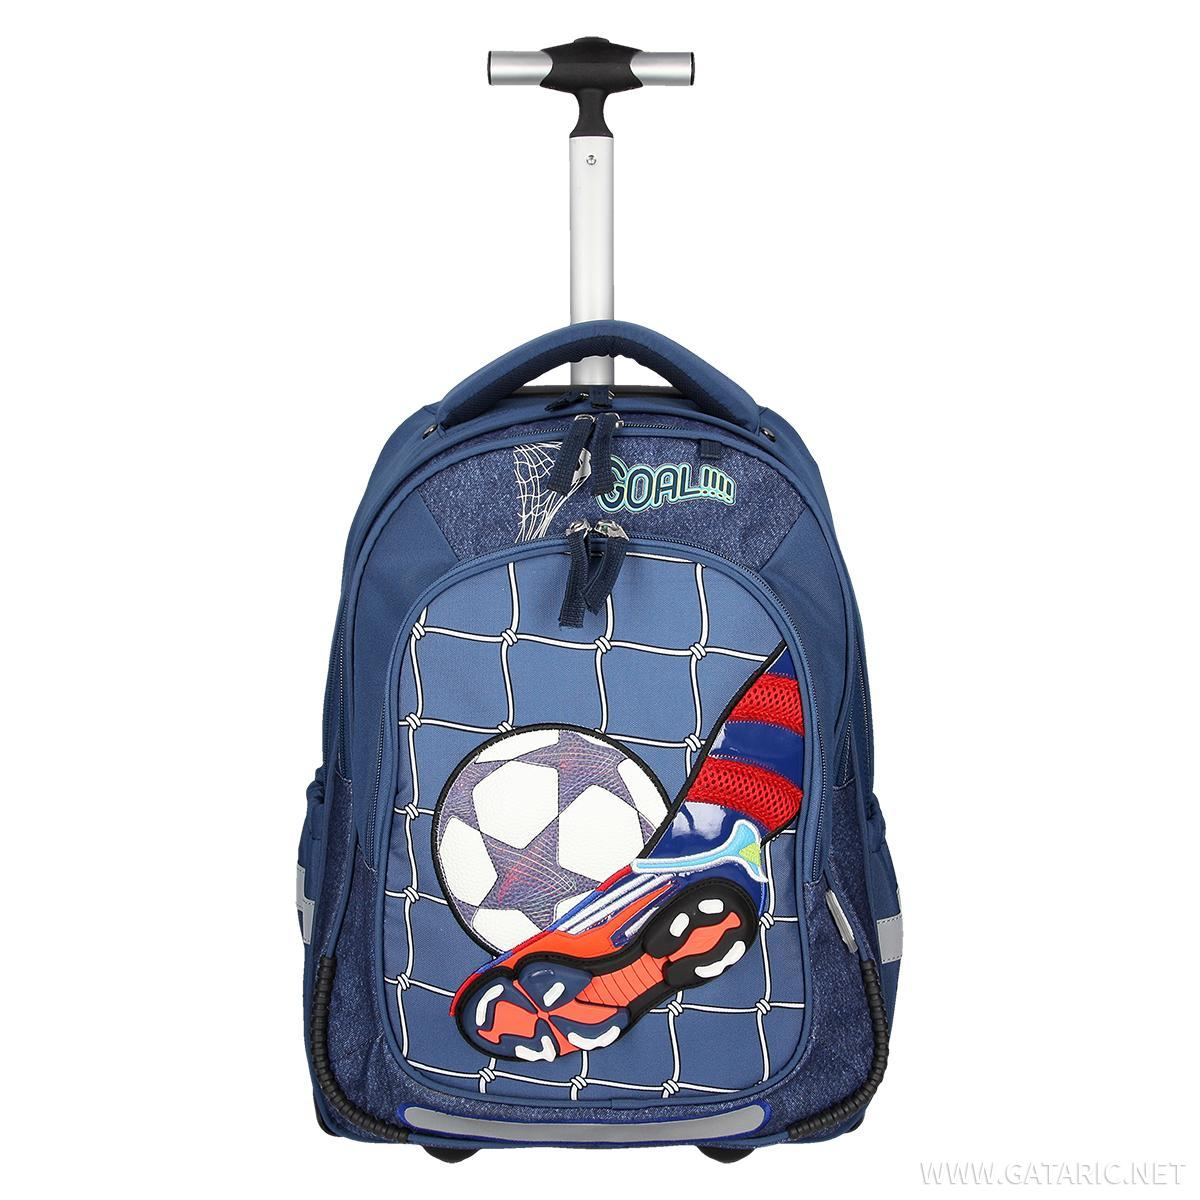 Backpack ''TROLLEY FOOTBALL''